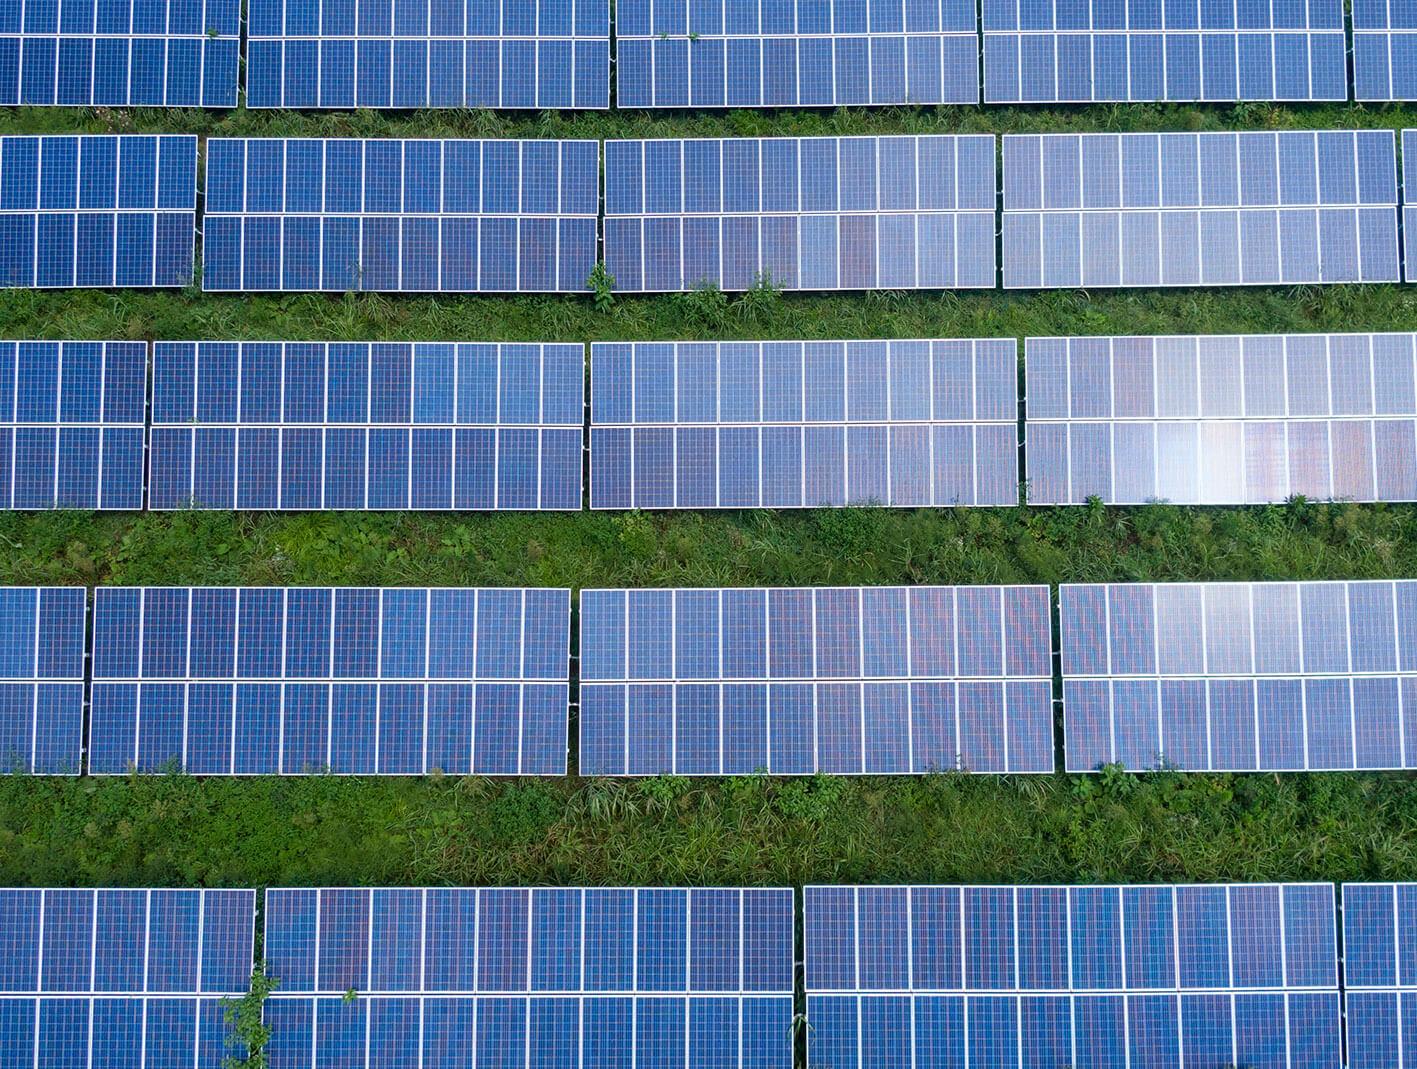 Proyecto fotovoltaico industrial